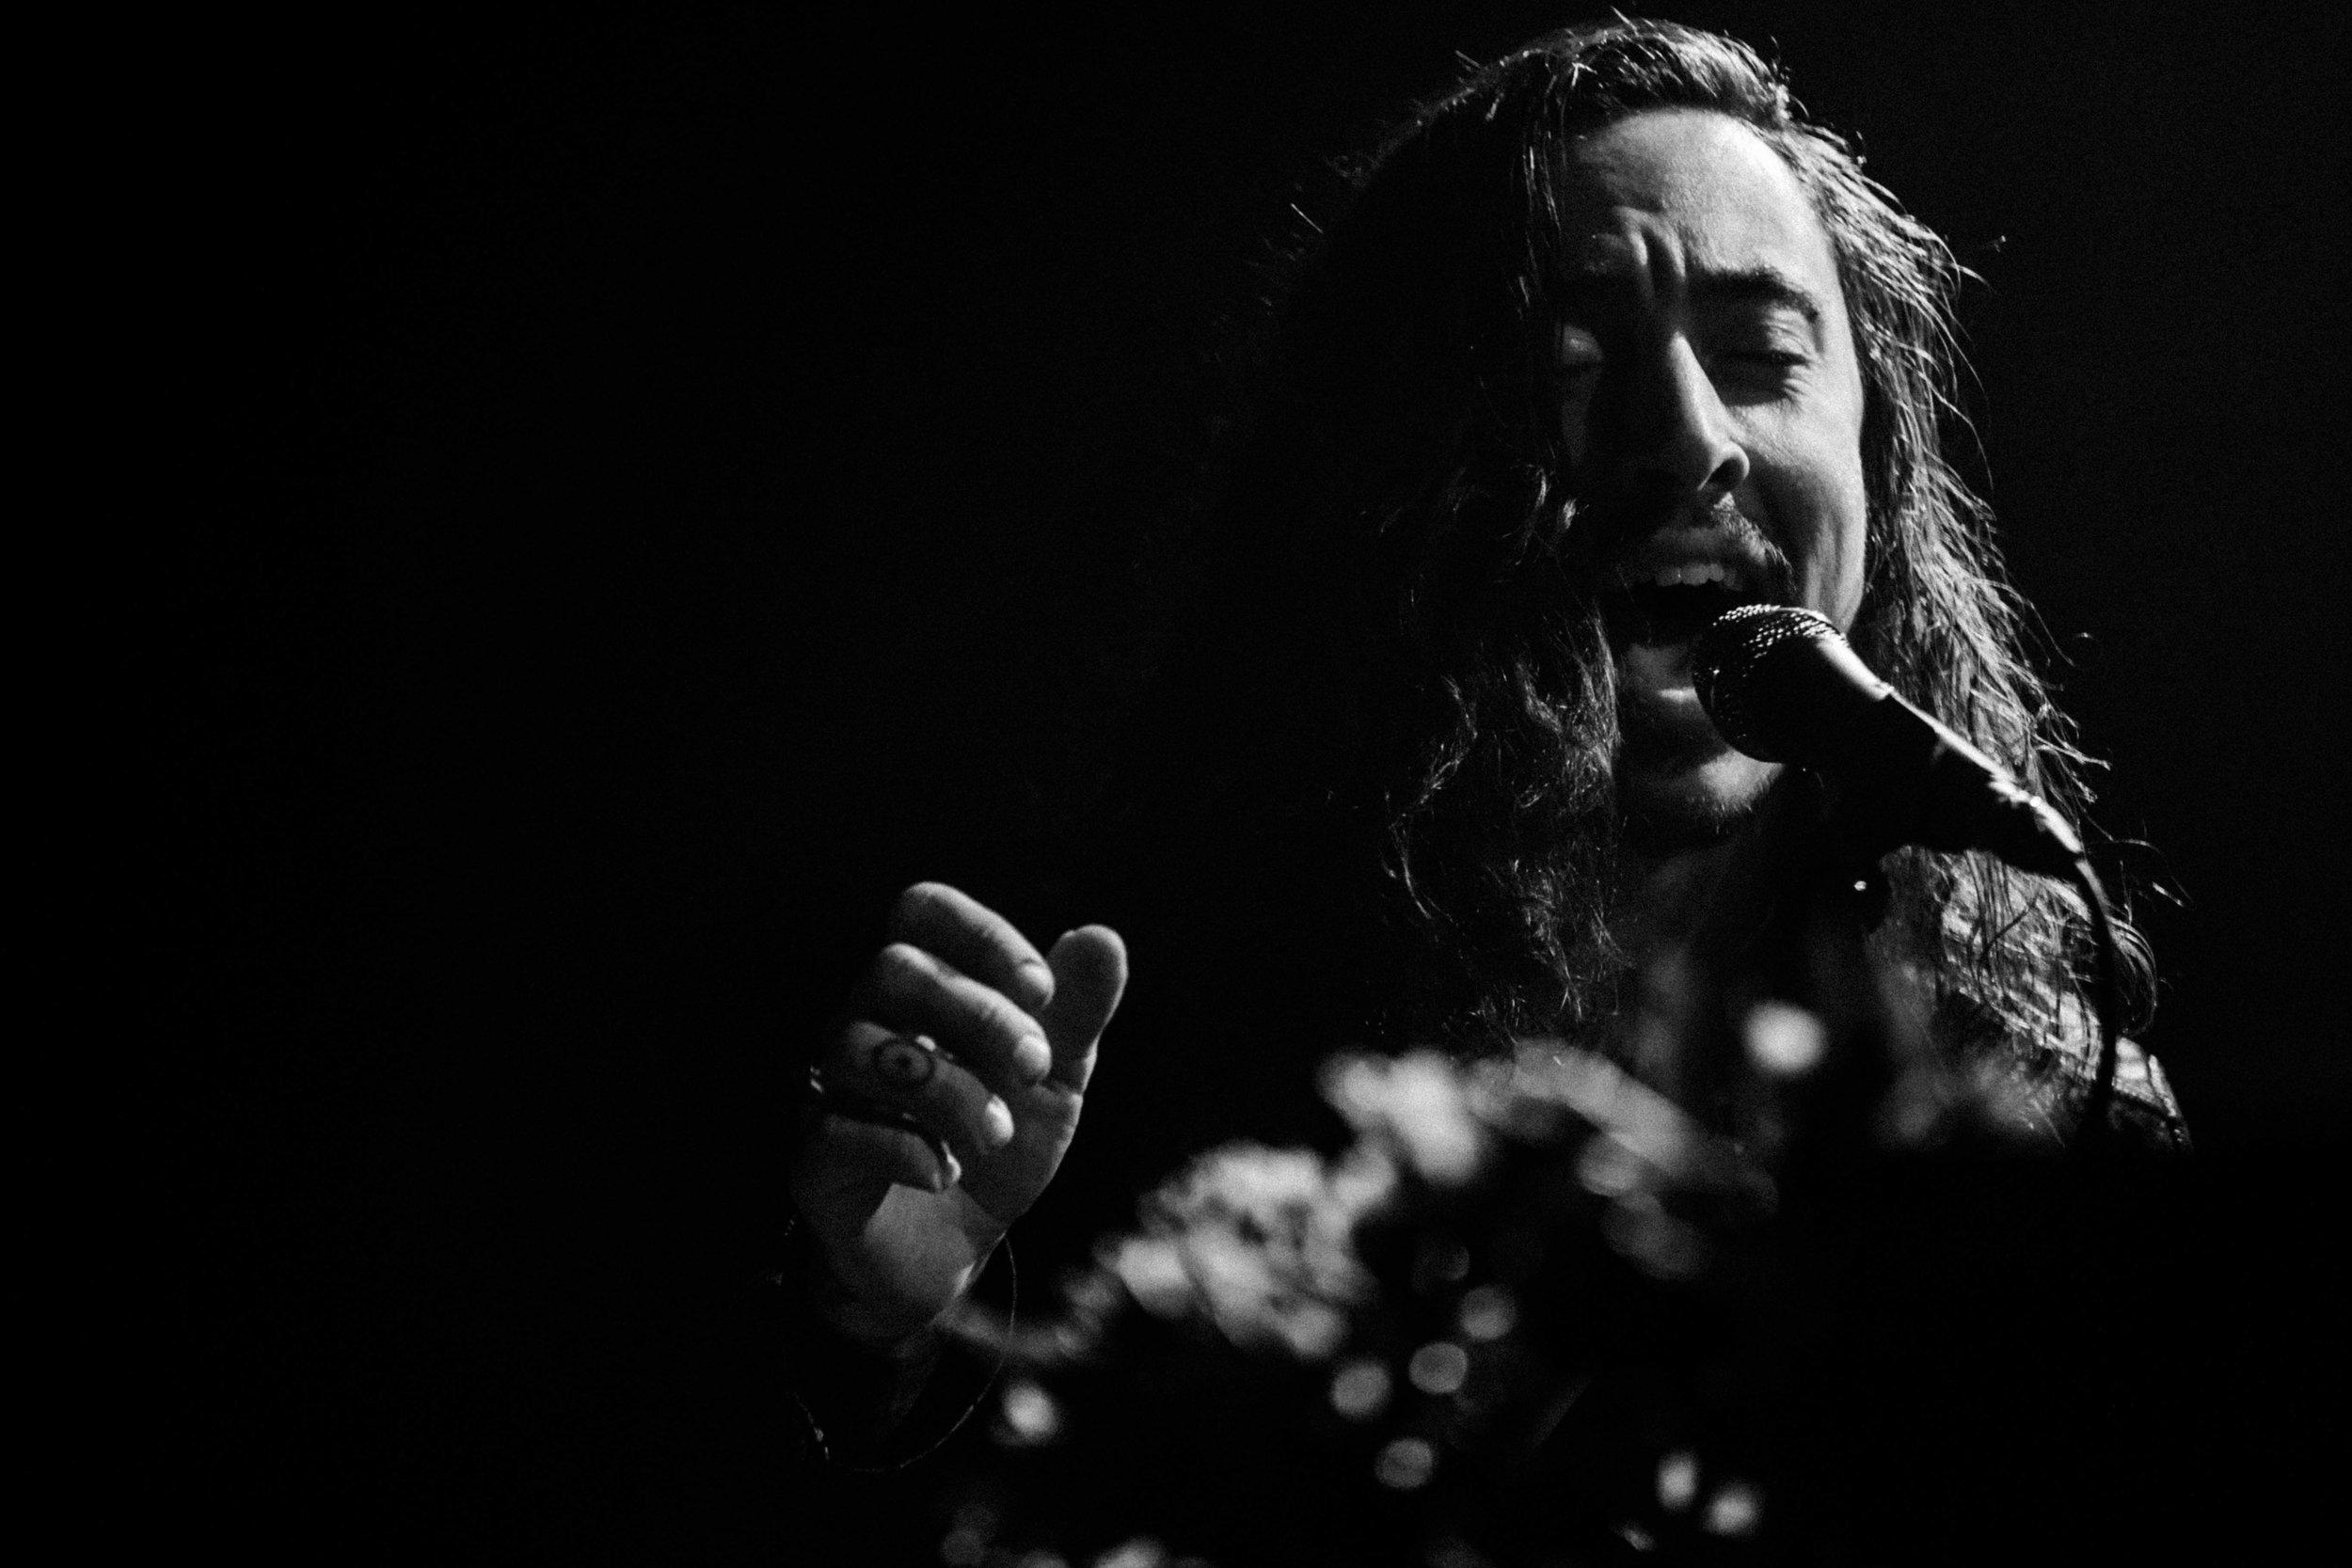 noah-gundersen-concert-el-rey-theatre-los-angeles-kirby-gladstein-2017-1